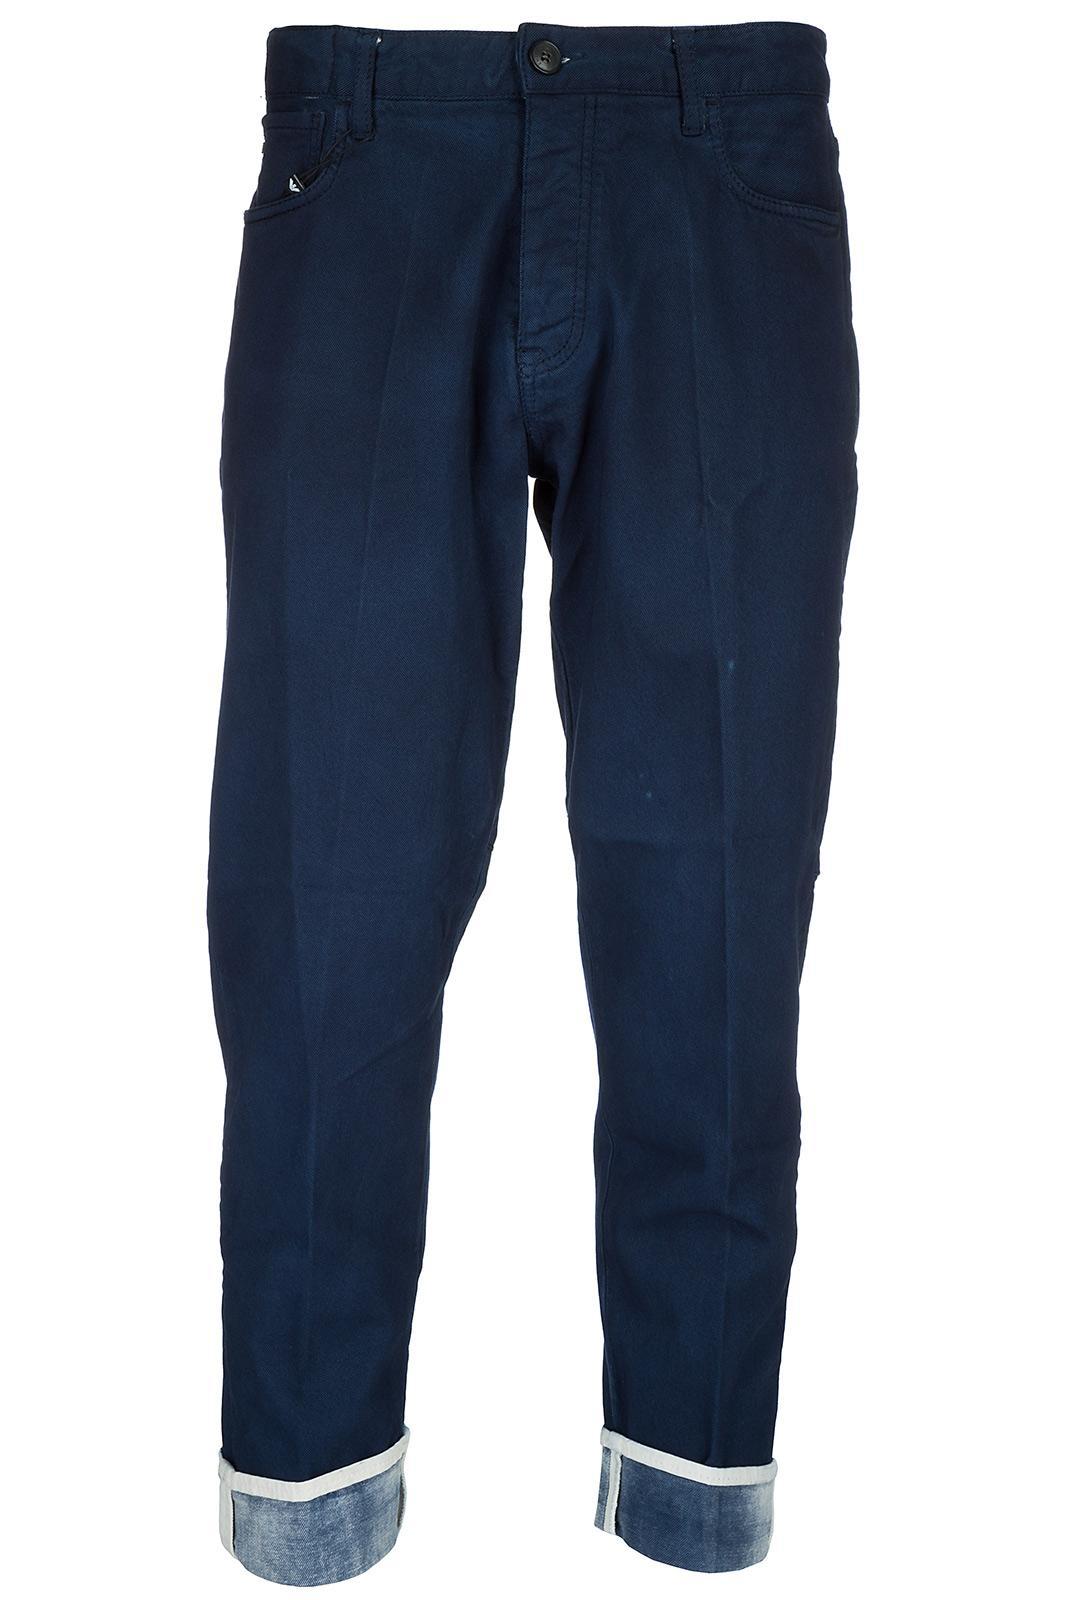 Emporio Armani Men's Jeans Denim In Blue